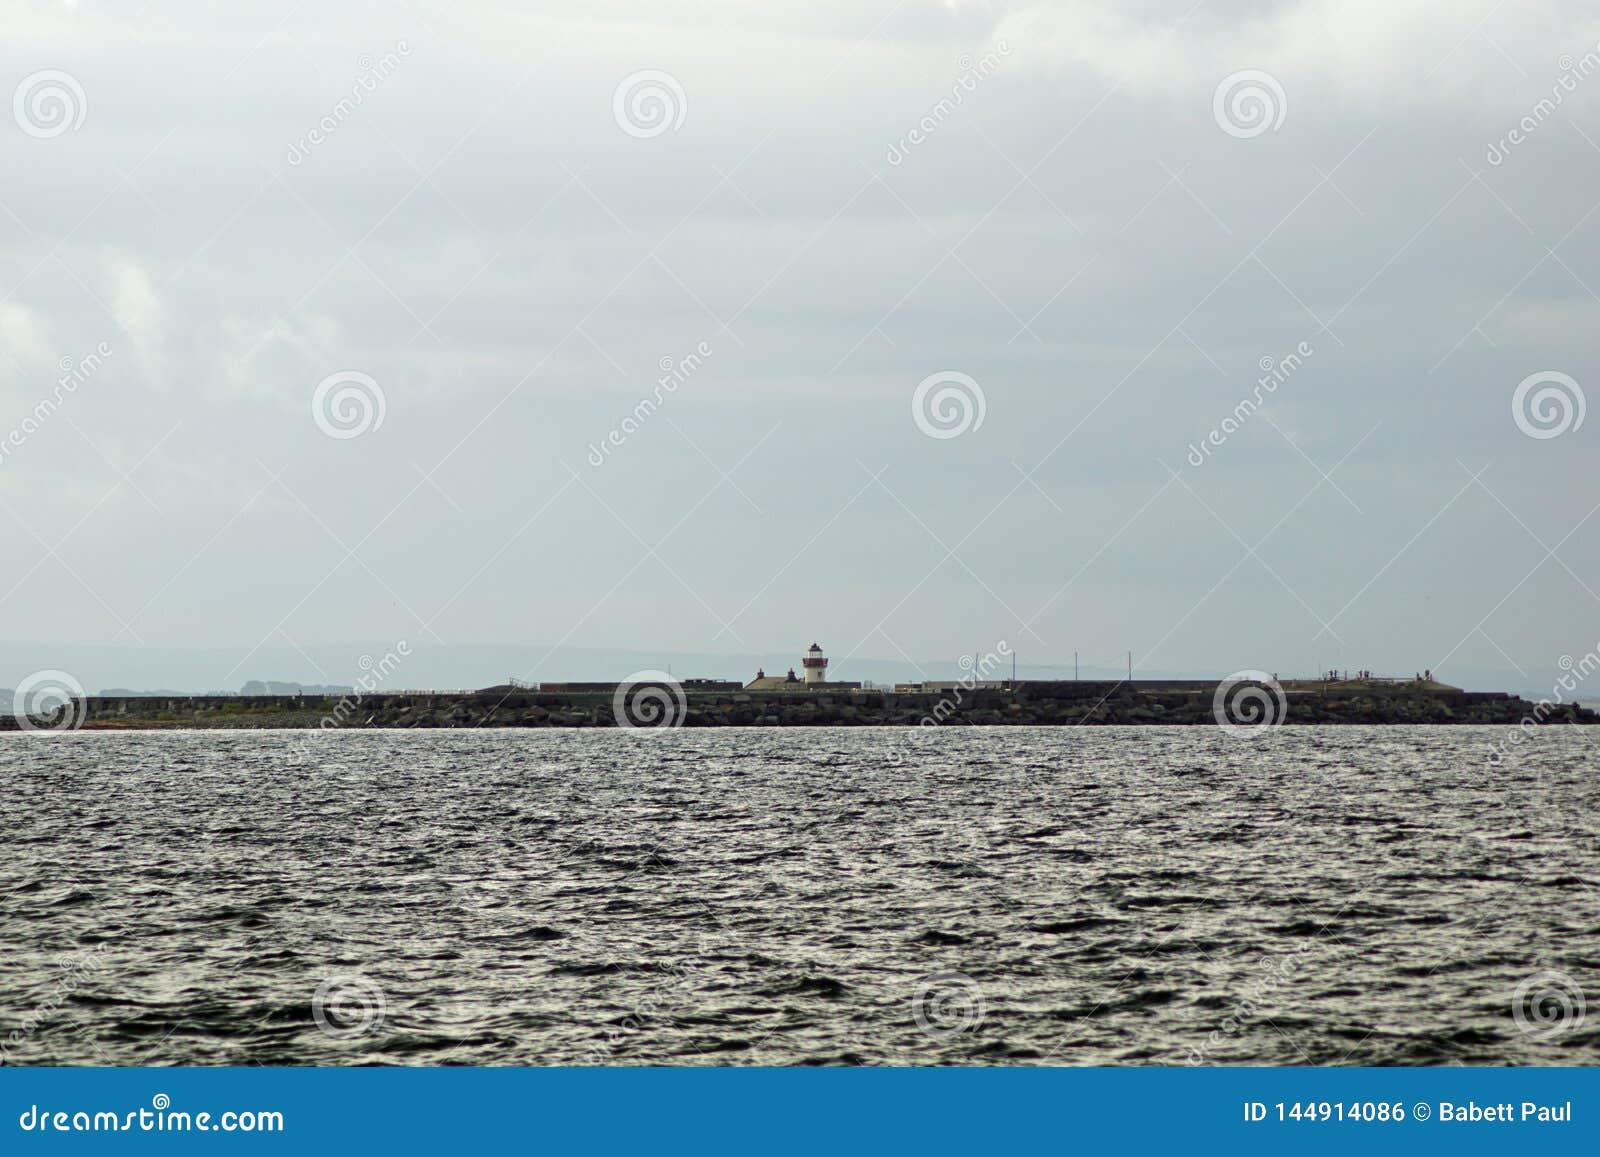 Wild Atlantic Way   The Mutton Island Lighthouse